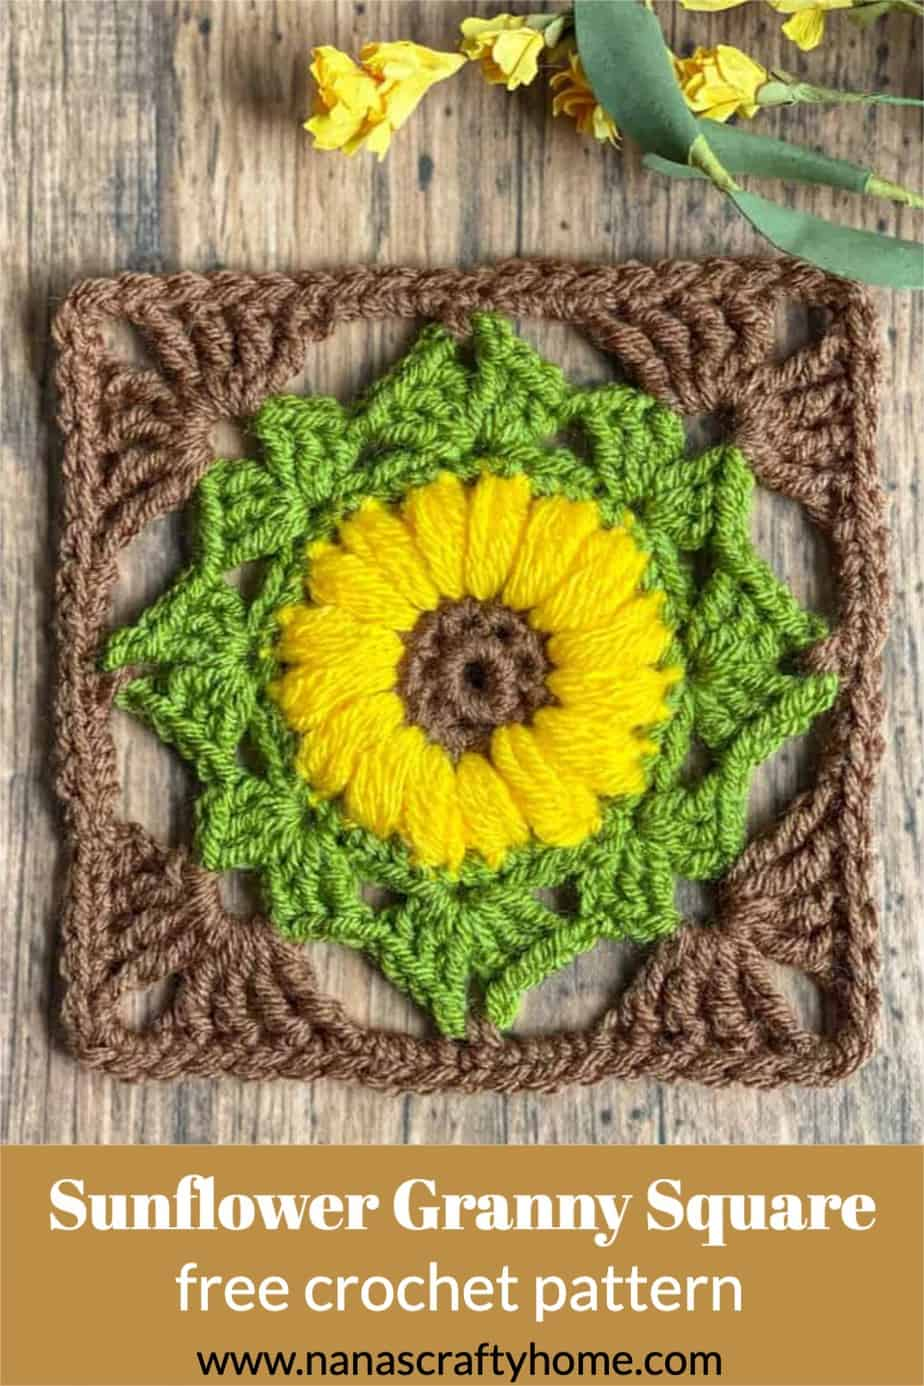 Sunflower Granny square free crochet pattern